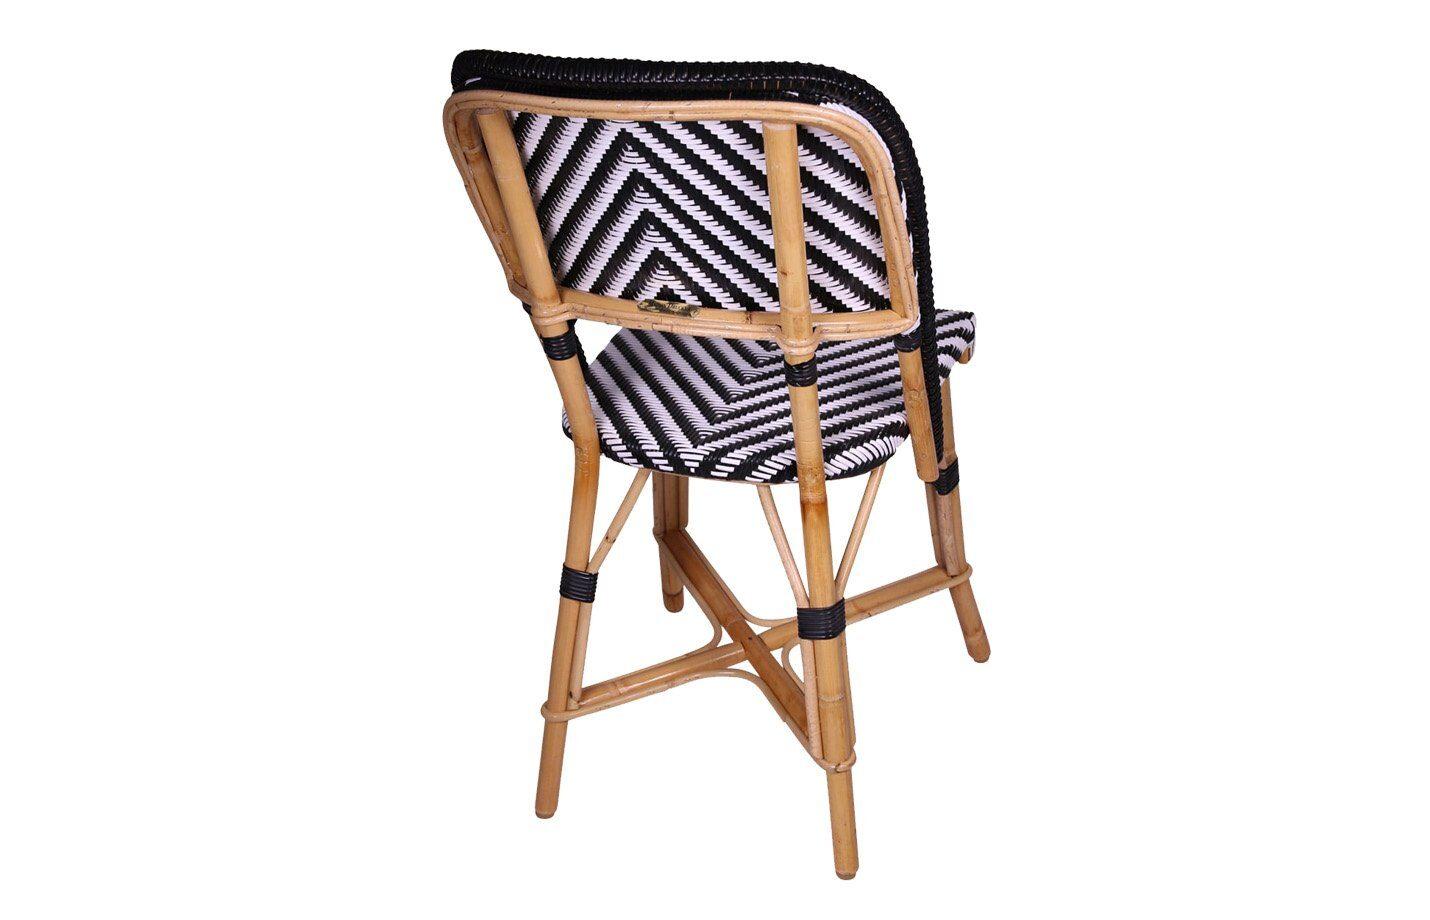 Chambord-S-white-black-Rattan-Side-Chair-02